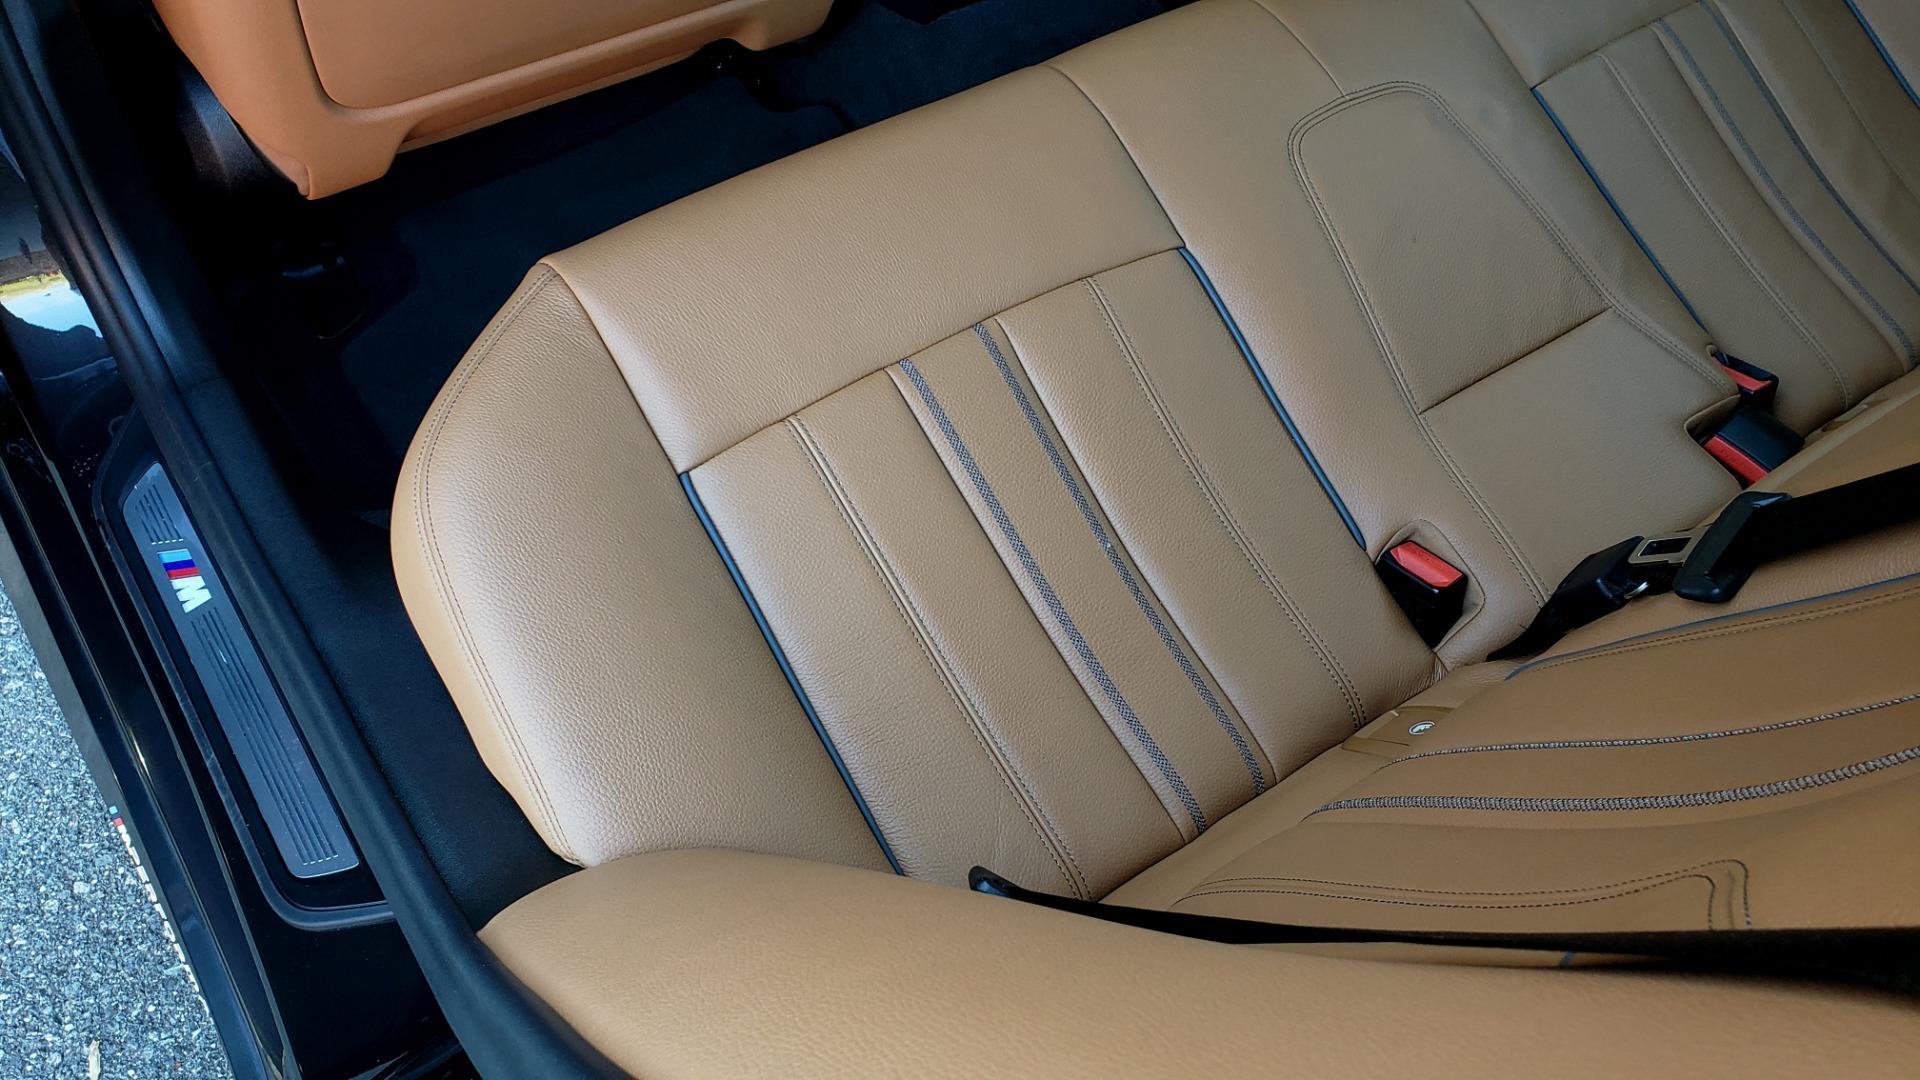 Used 2018 BMW 5 SERIES 540I M-SPORT / DRVR ASST / EXEC PKG / NAV / SUNROOF / HUD / REARVIEW for sale Sold at Formula Imports in Charlotte NC 28227 62